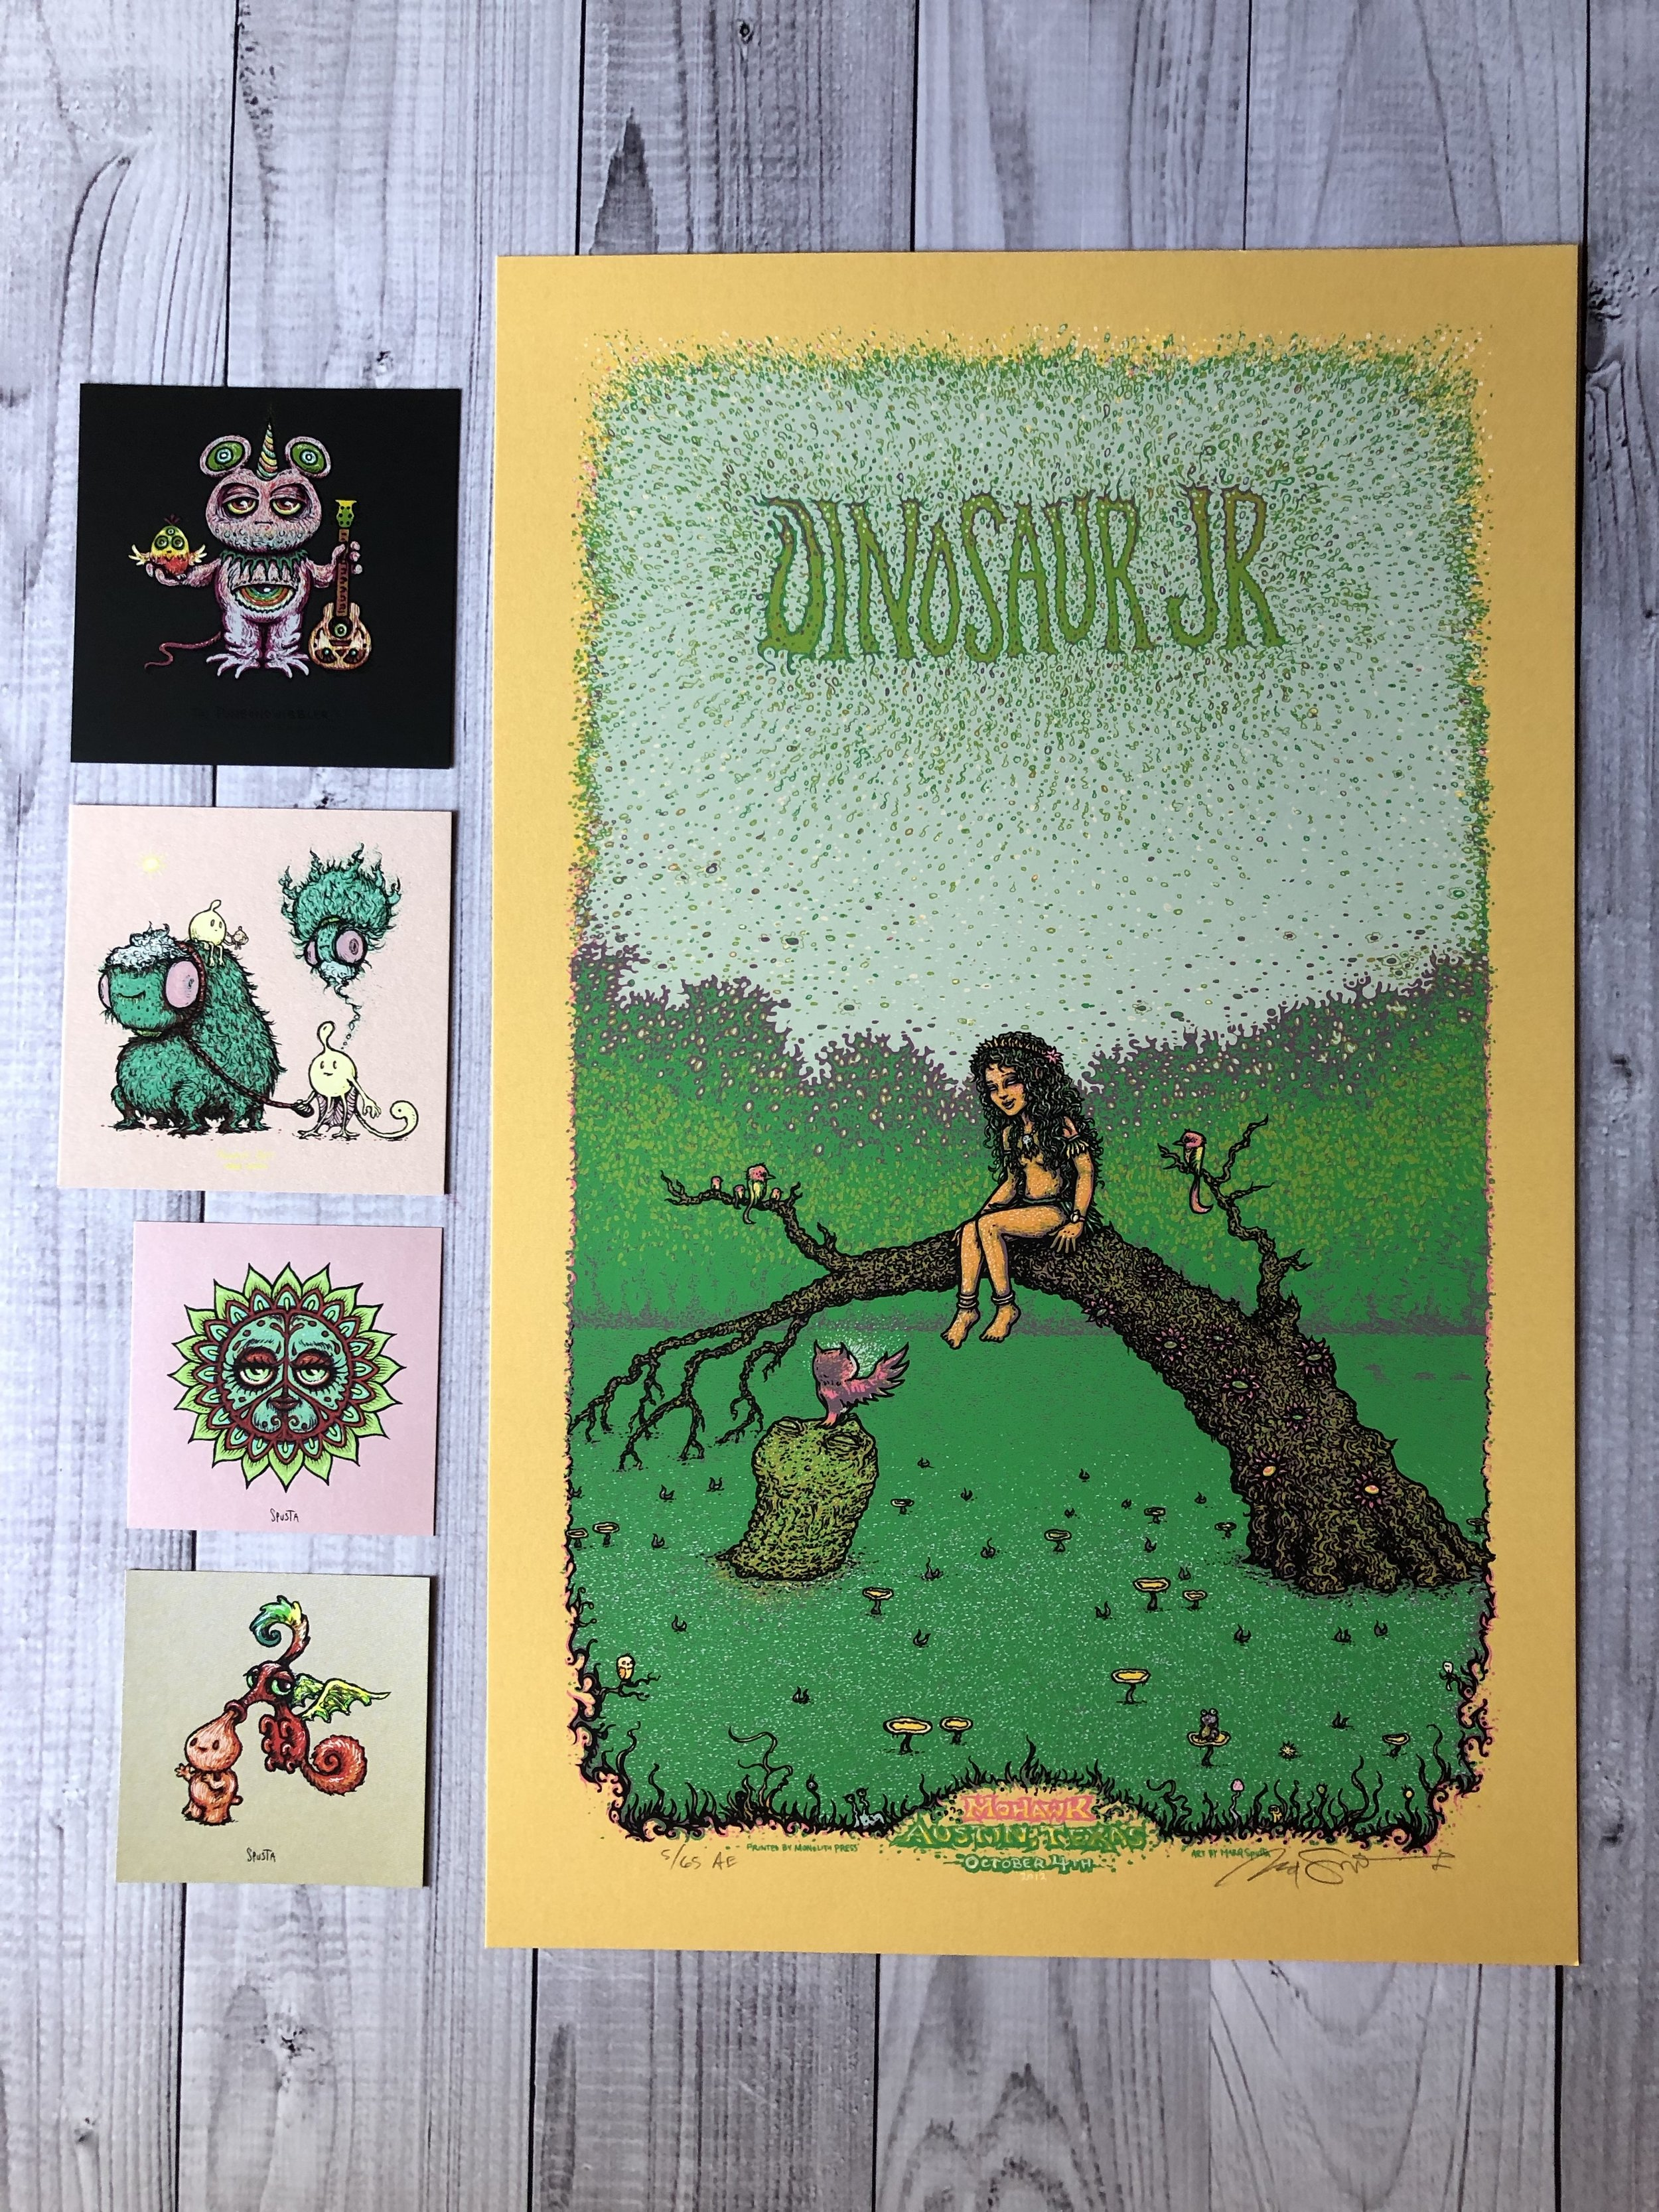 $100 Set B - Dinosaur Jr Artist Edition + Minis